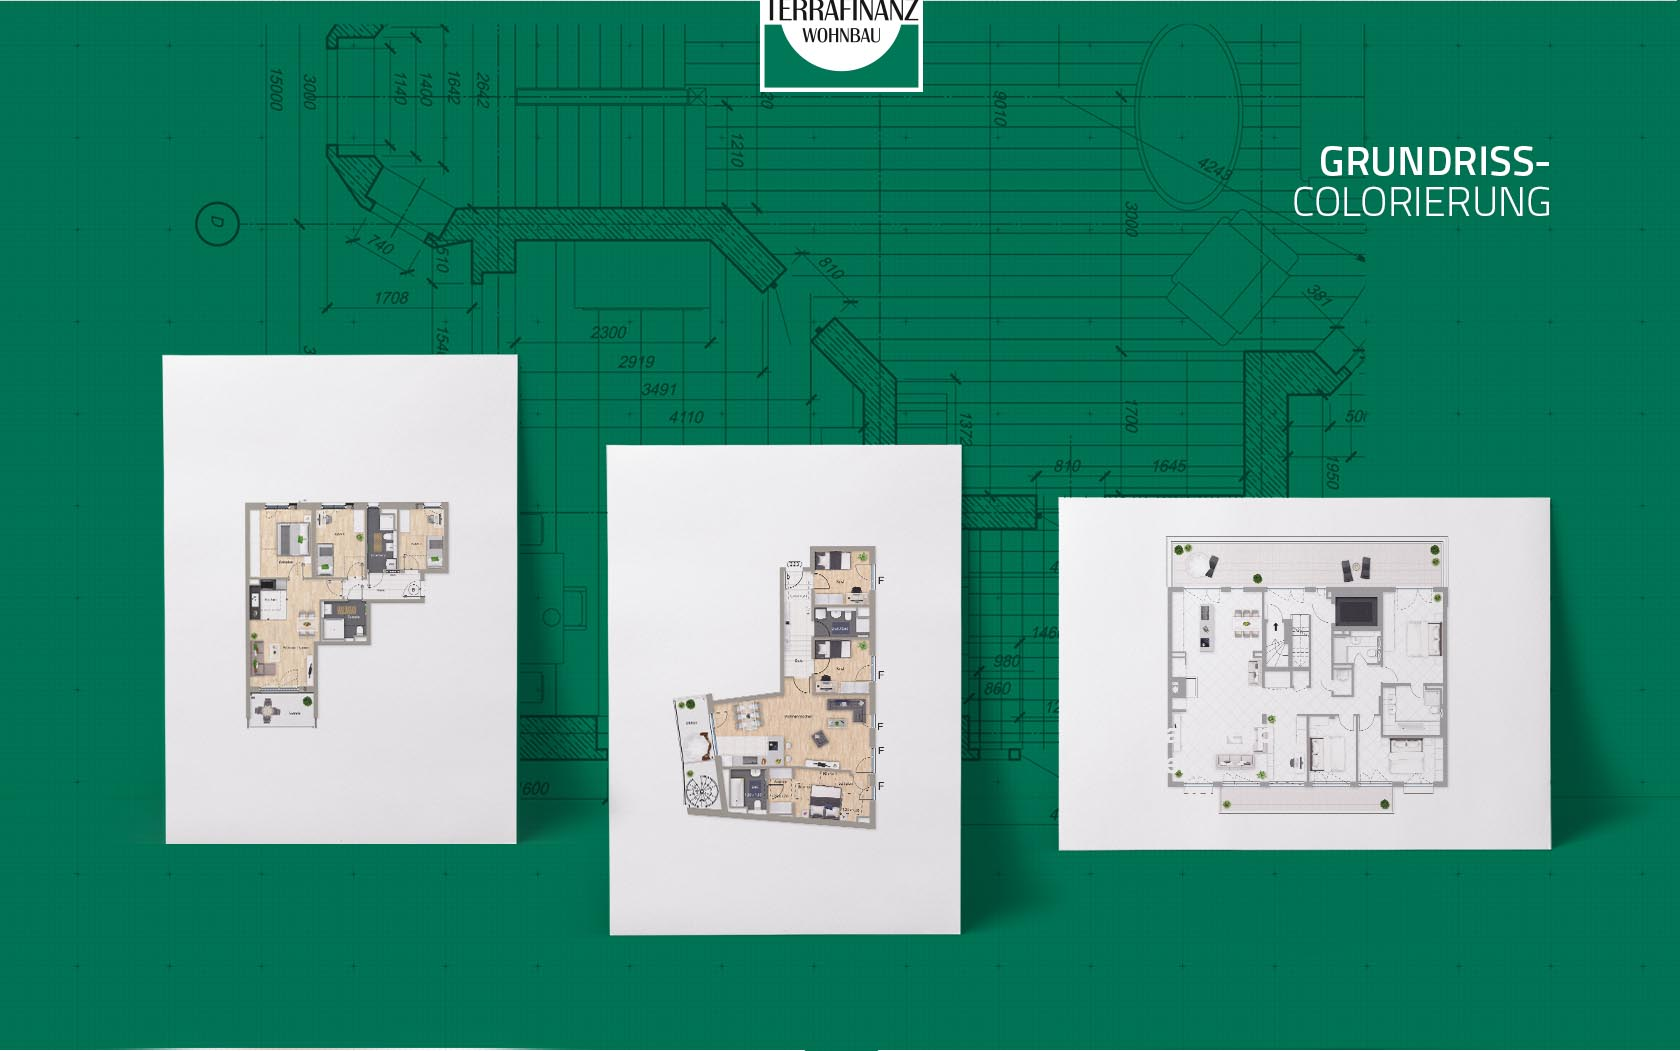 EAZEE Immobilienmarketing Terrafinanz Neubau Grundrisse Koloriert V